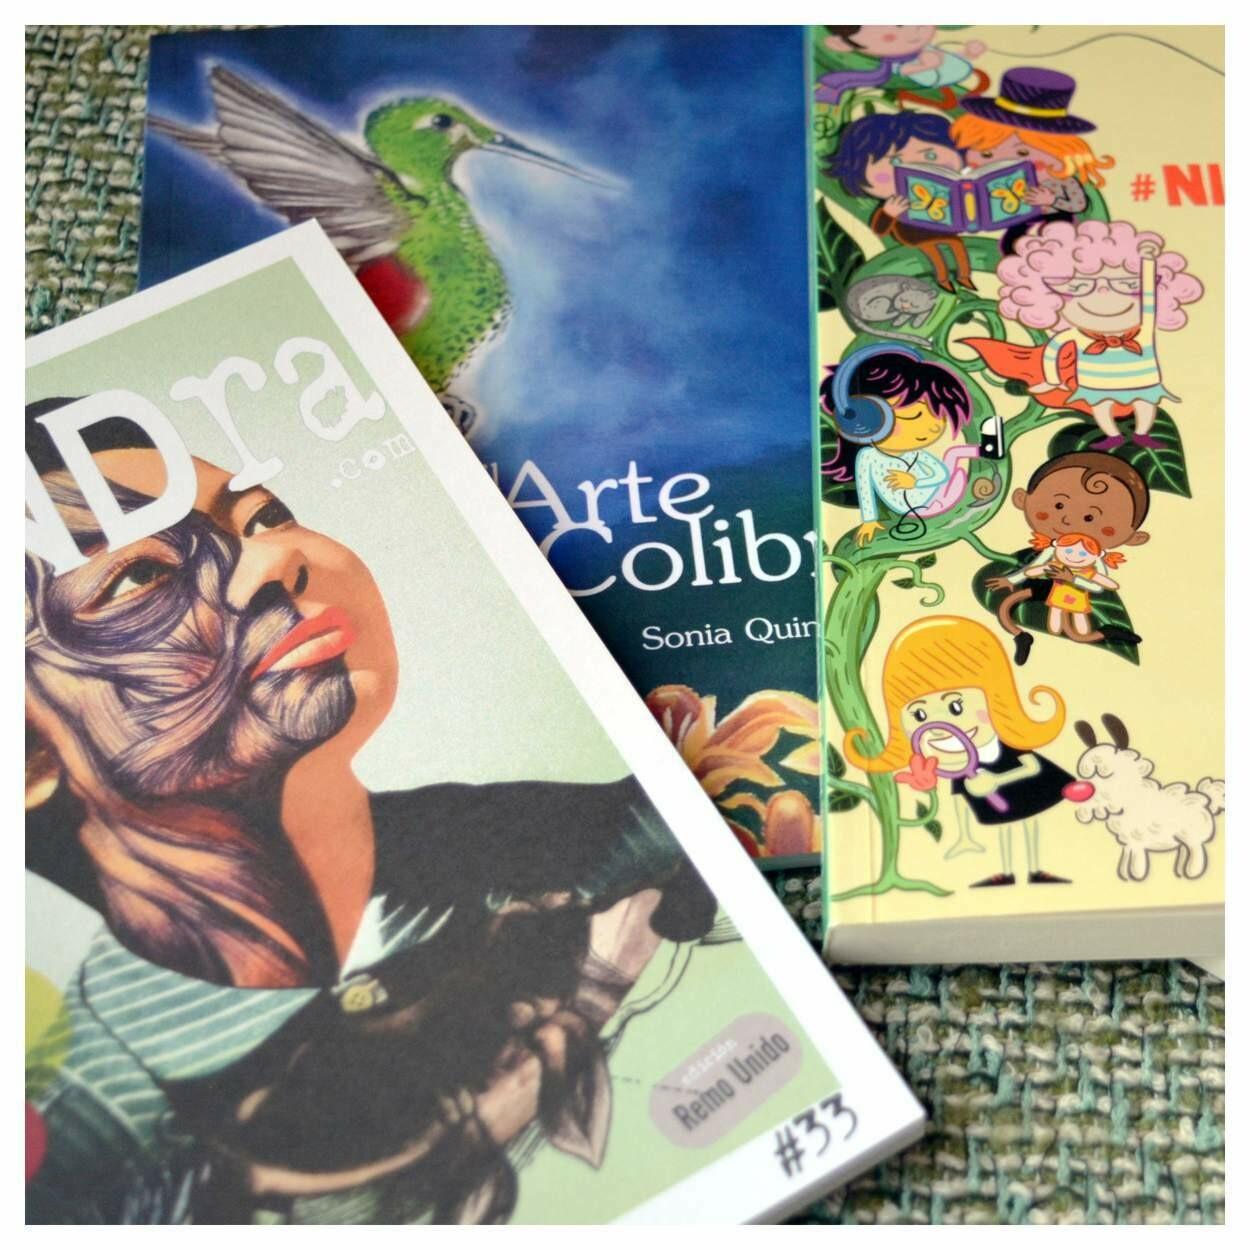 The Green Bundle Books